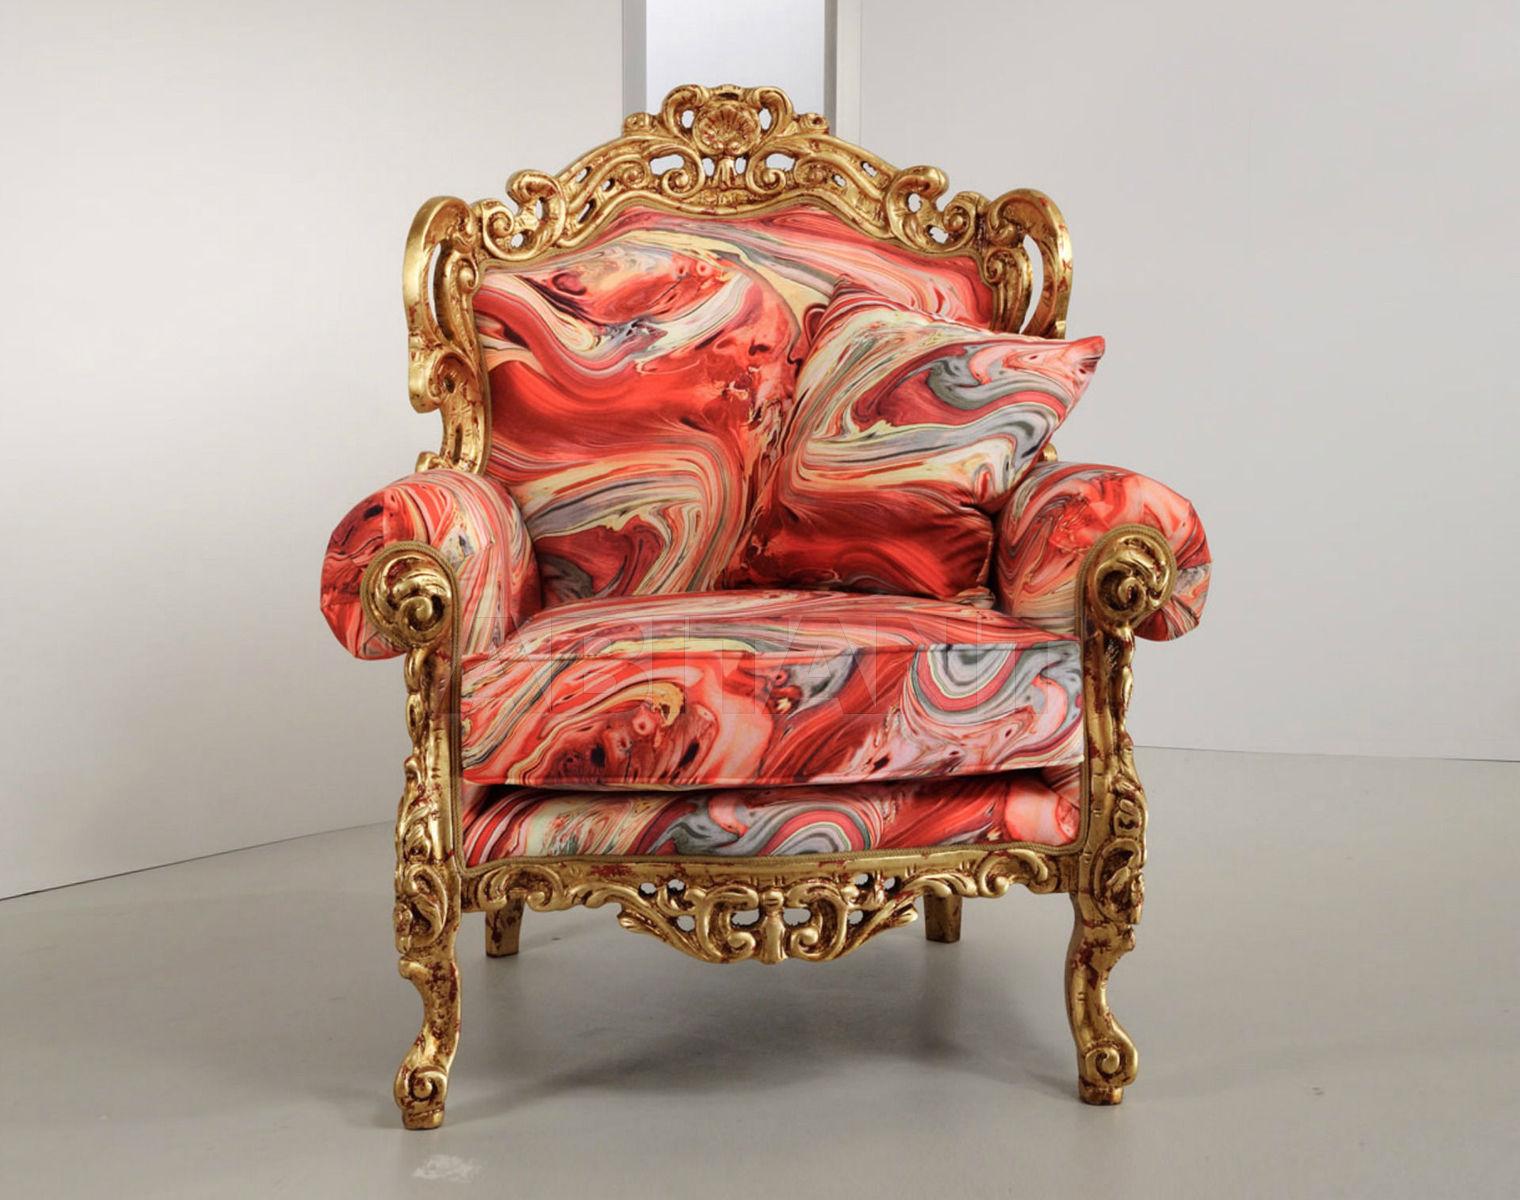 Купить Кресло Splendid RM Arredamenti - Capricio Capricio 10150.P